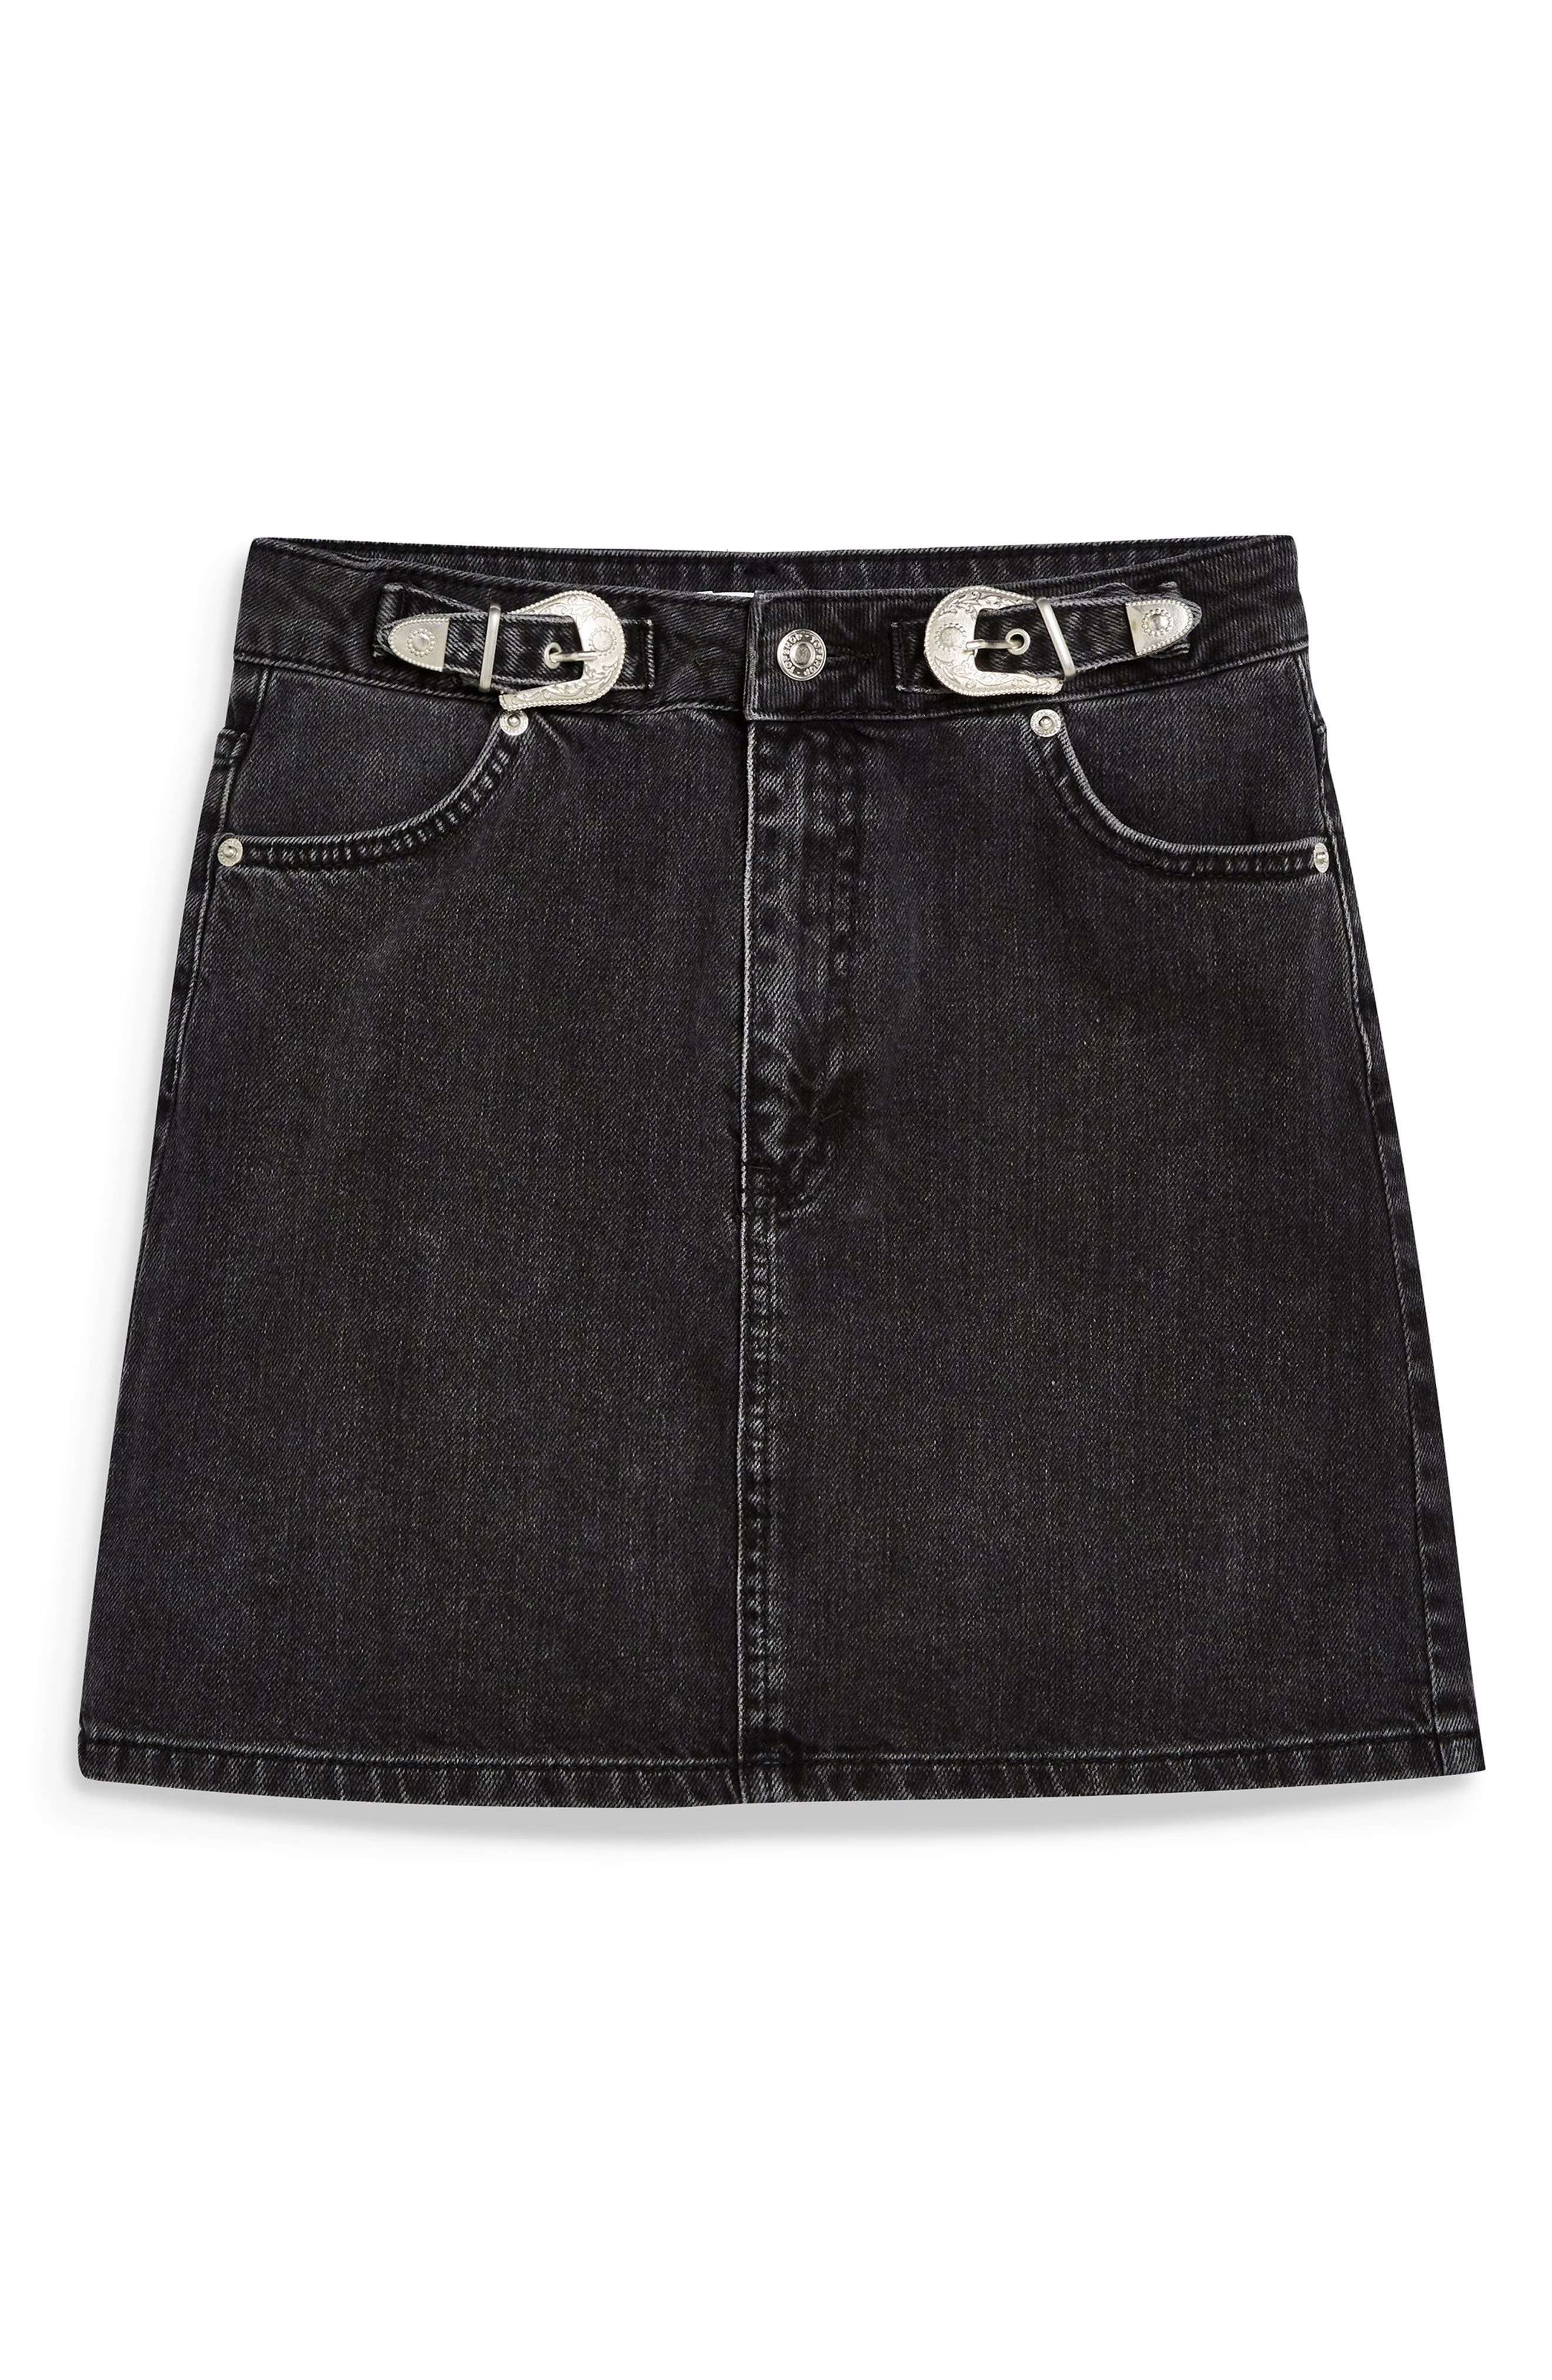 TOPSHOP, Buckle Denim Skirt, Alternate thumbnail 5, color, 002